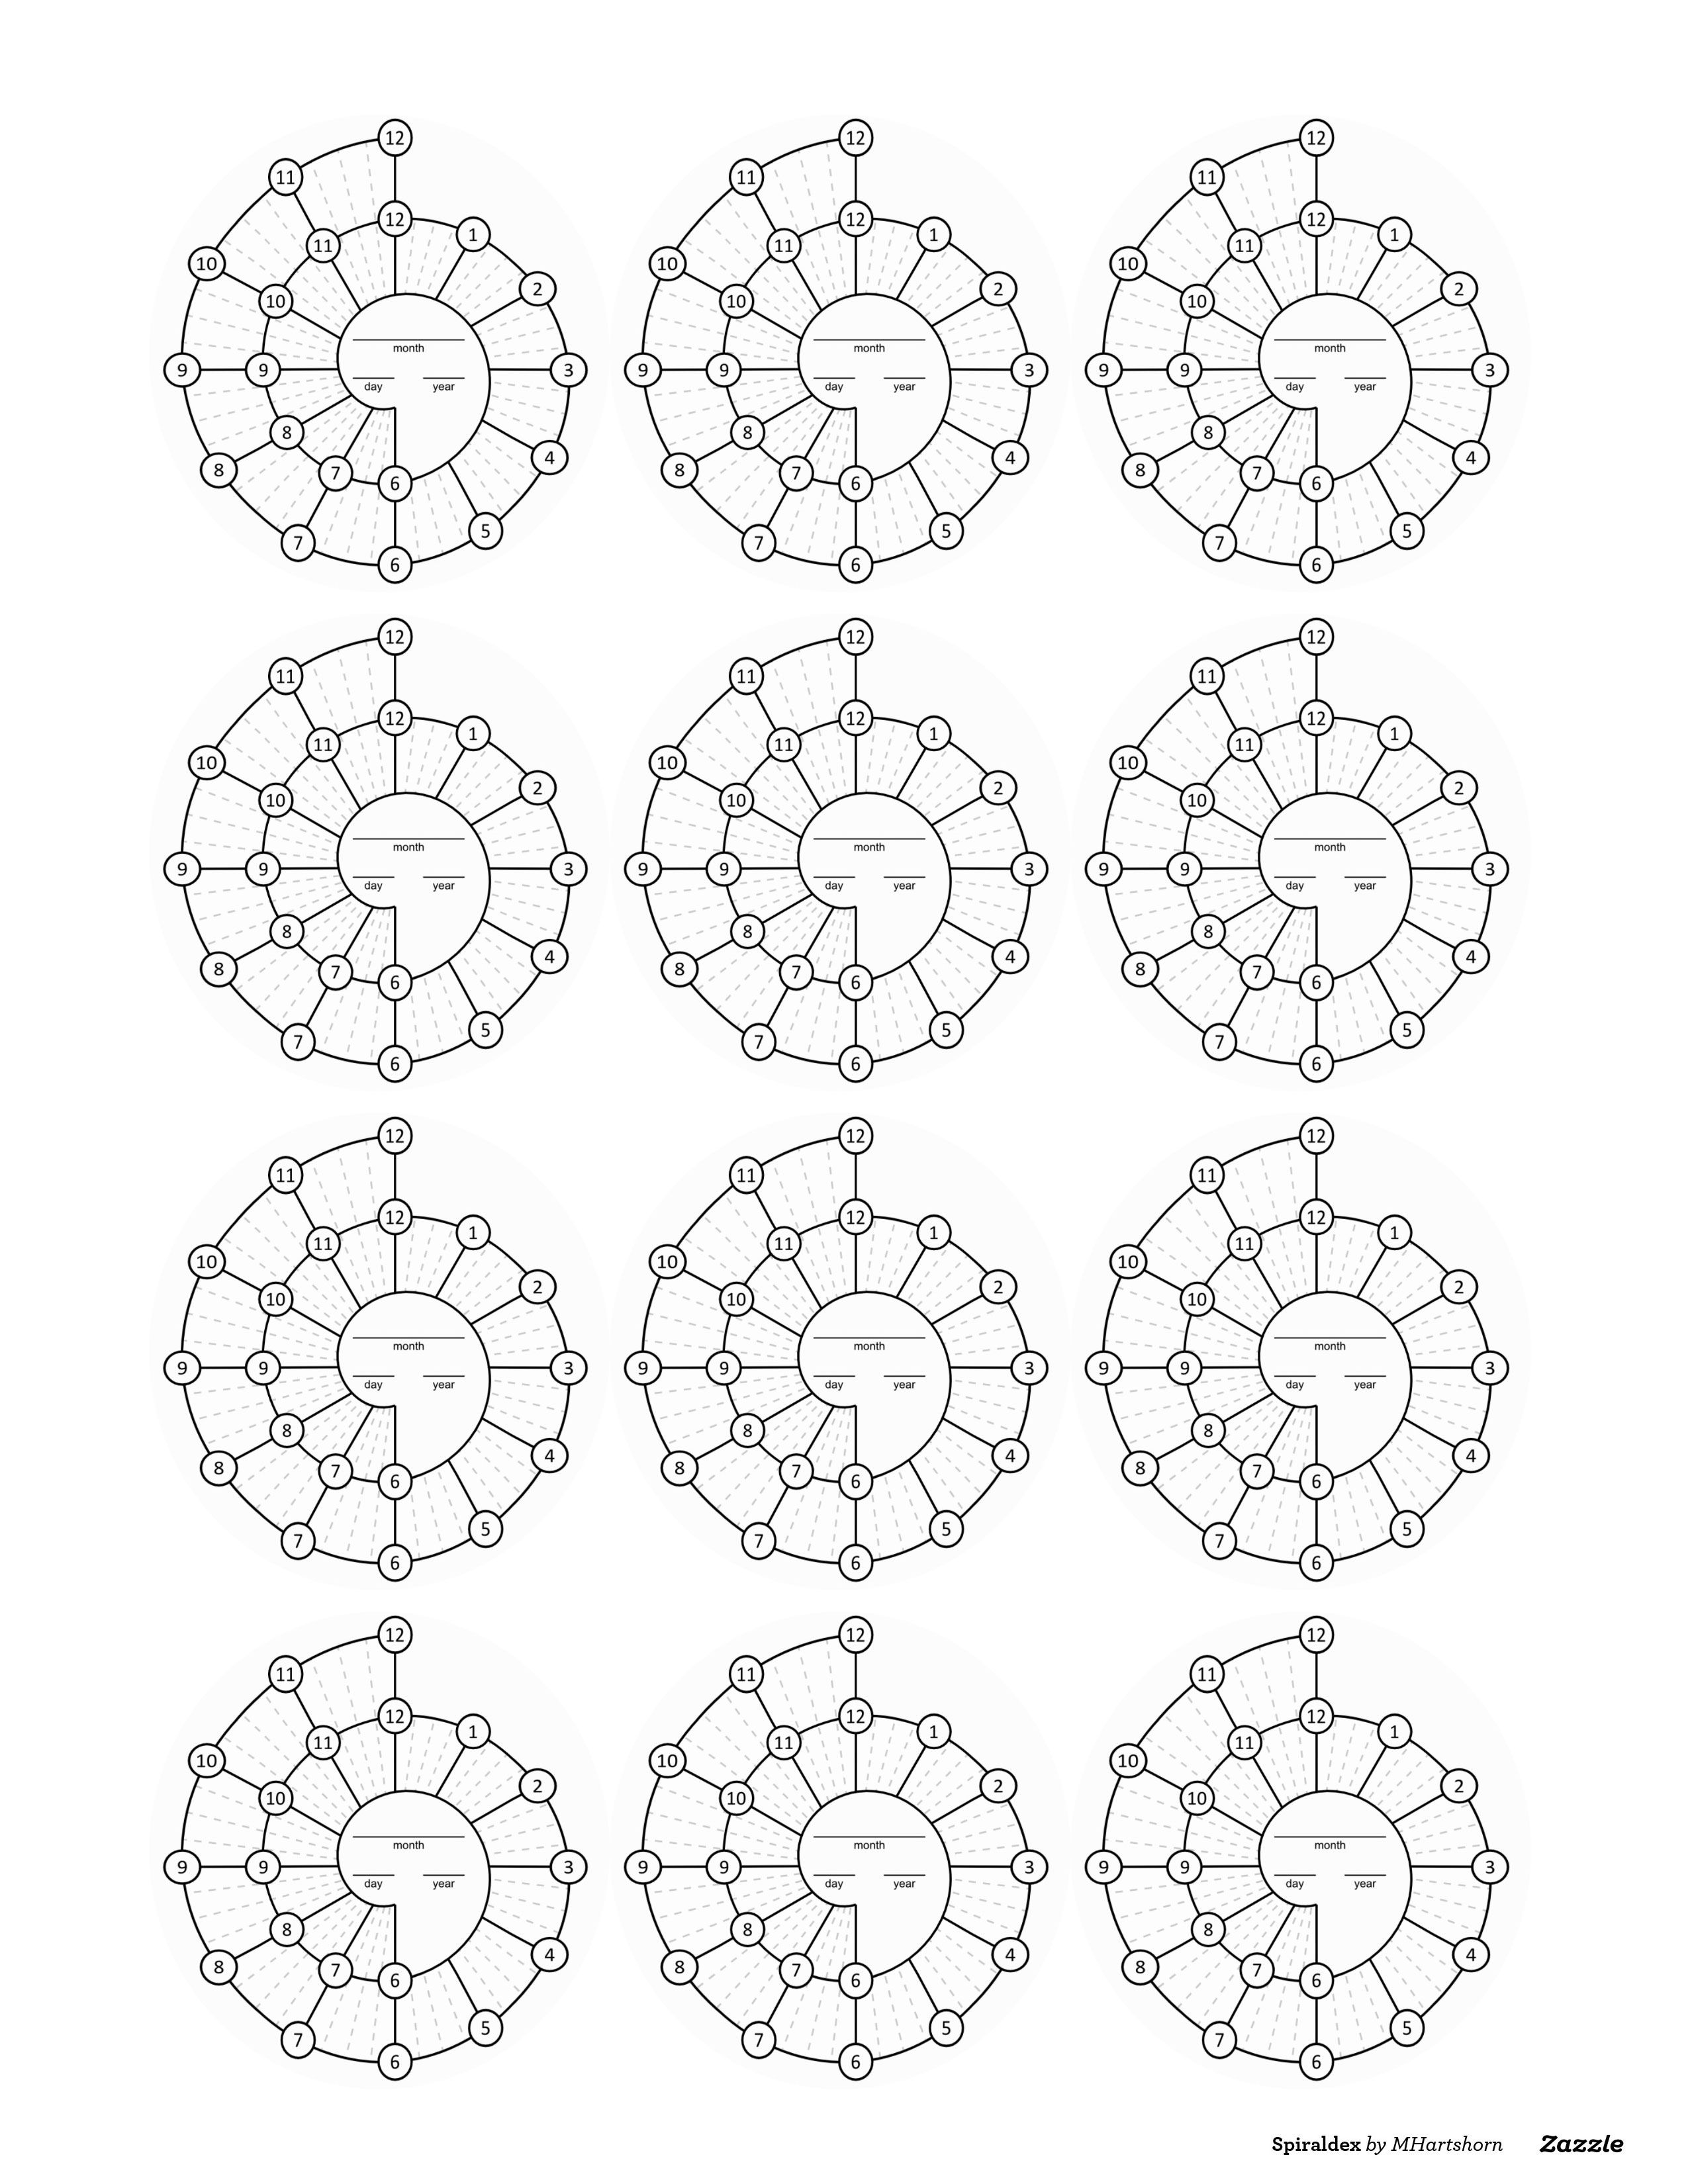 Spiraldex 3x4 array for print (8.5